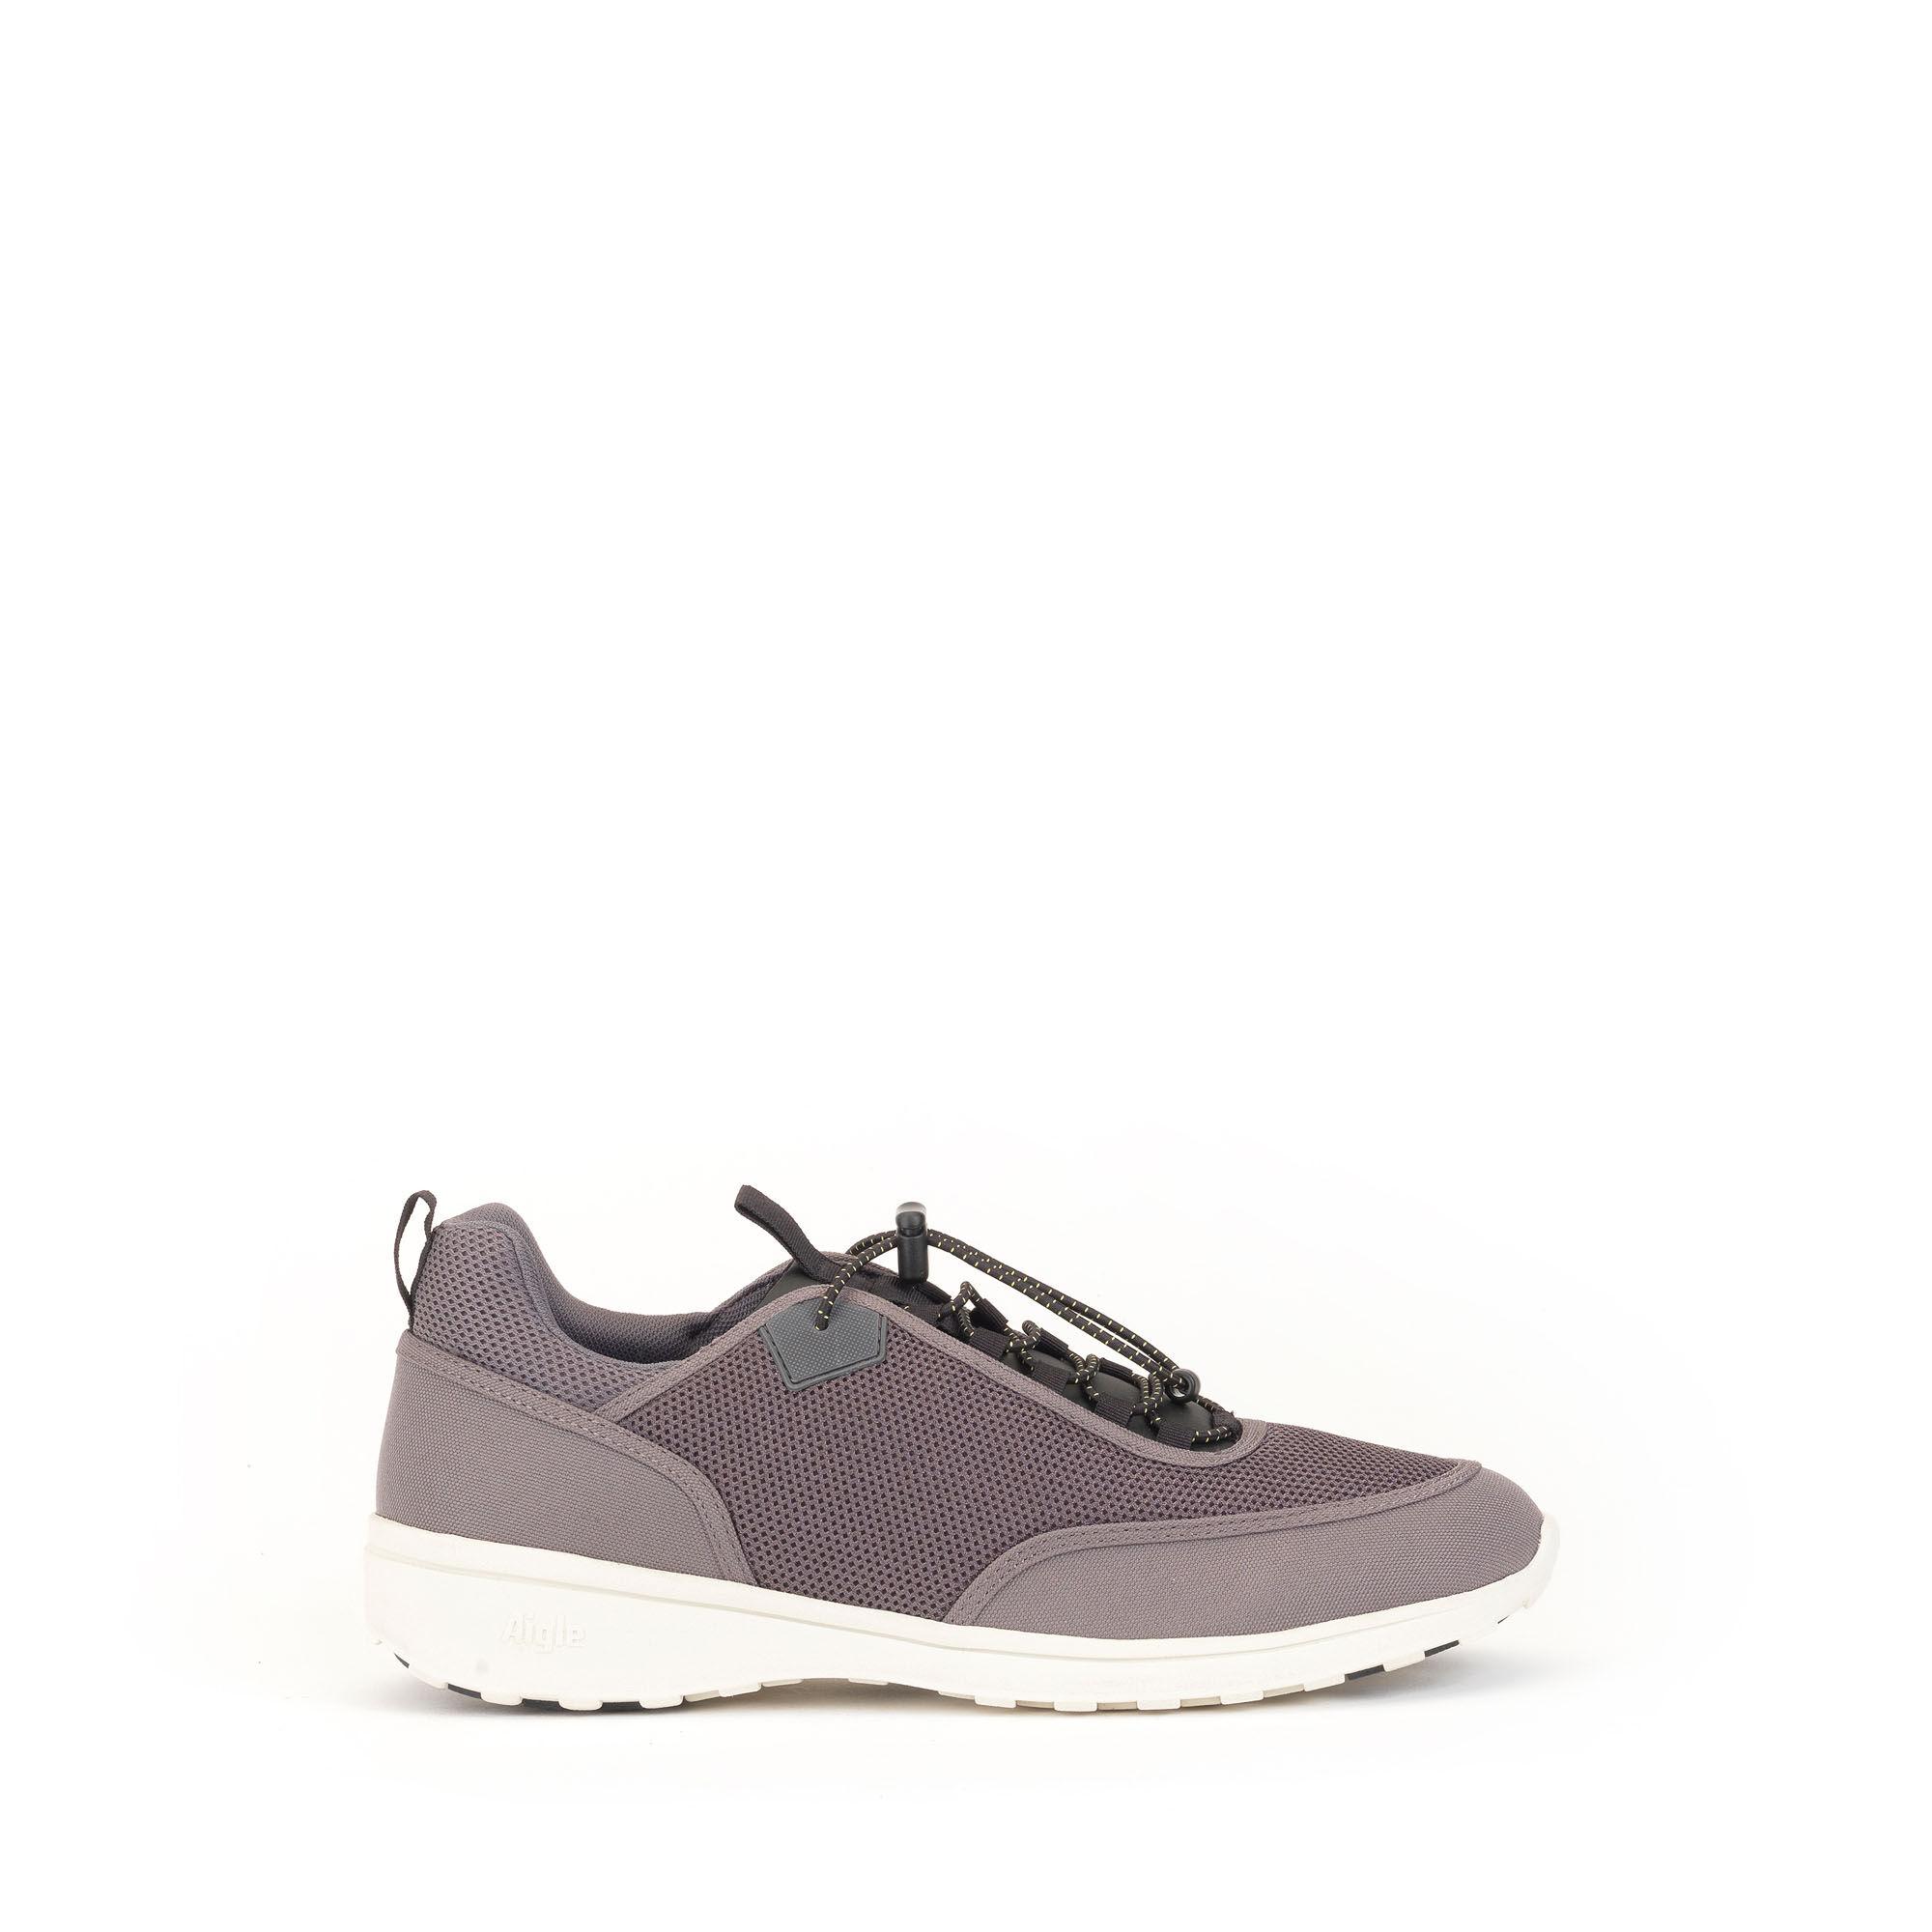 Chaussures à lacets blanches Casual garçon 24GplA8pVH